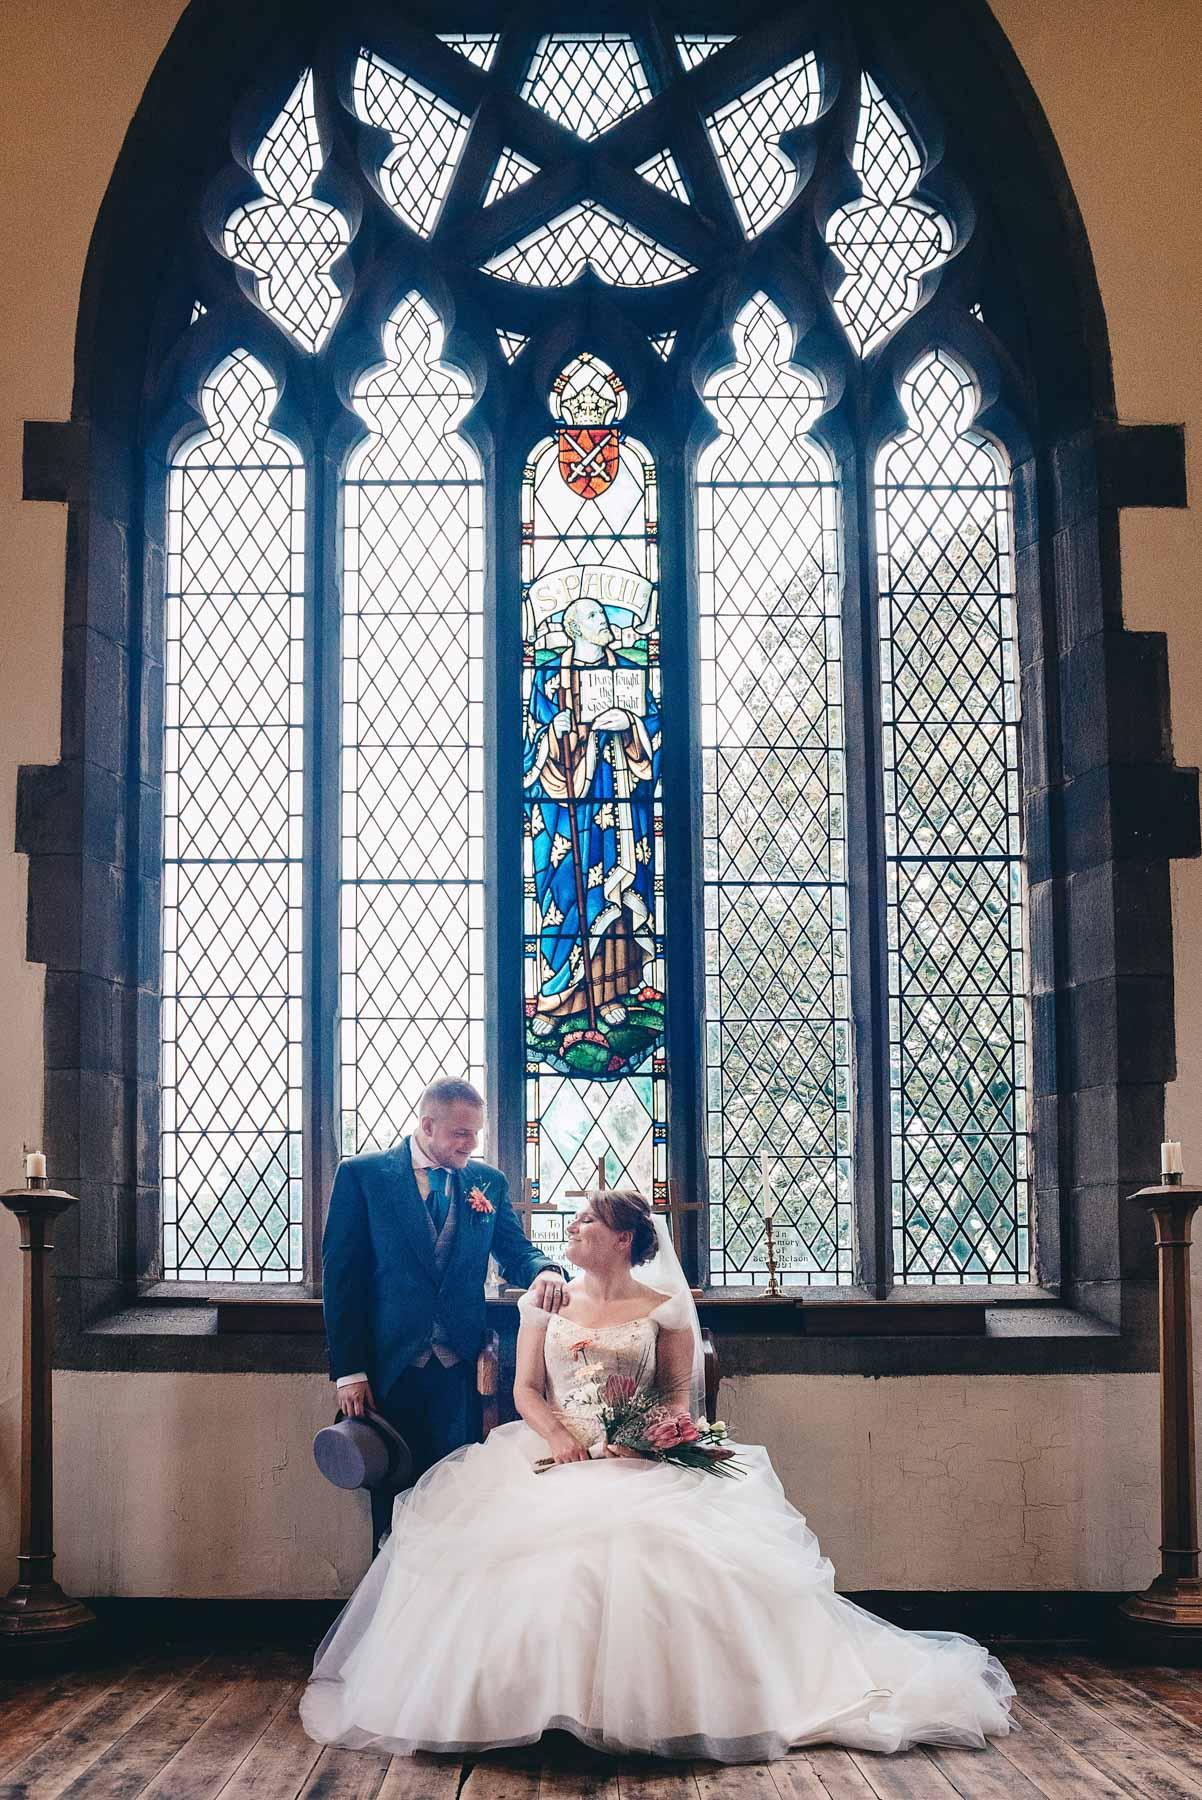 Bride and groom pose underneath window